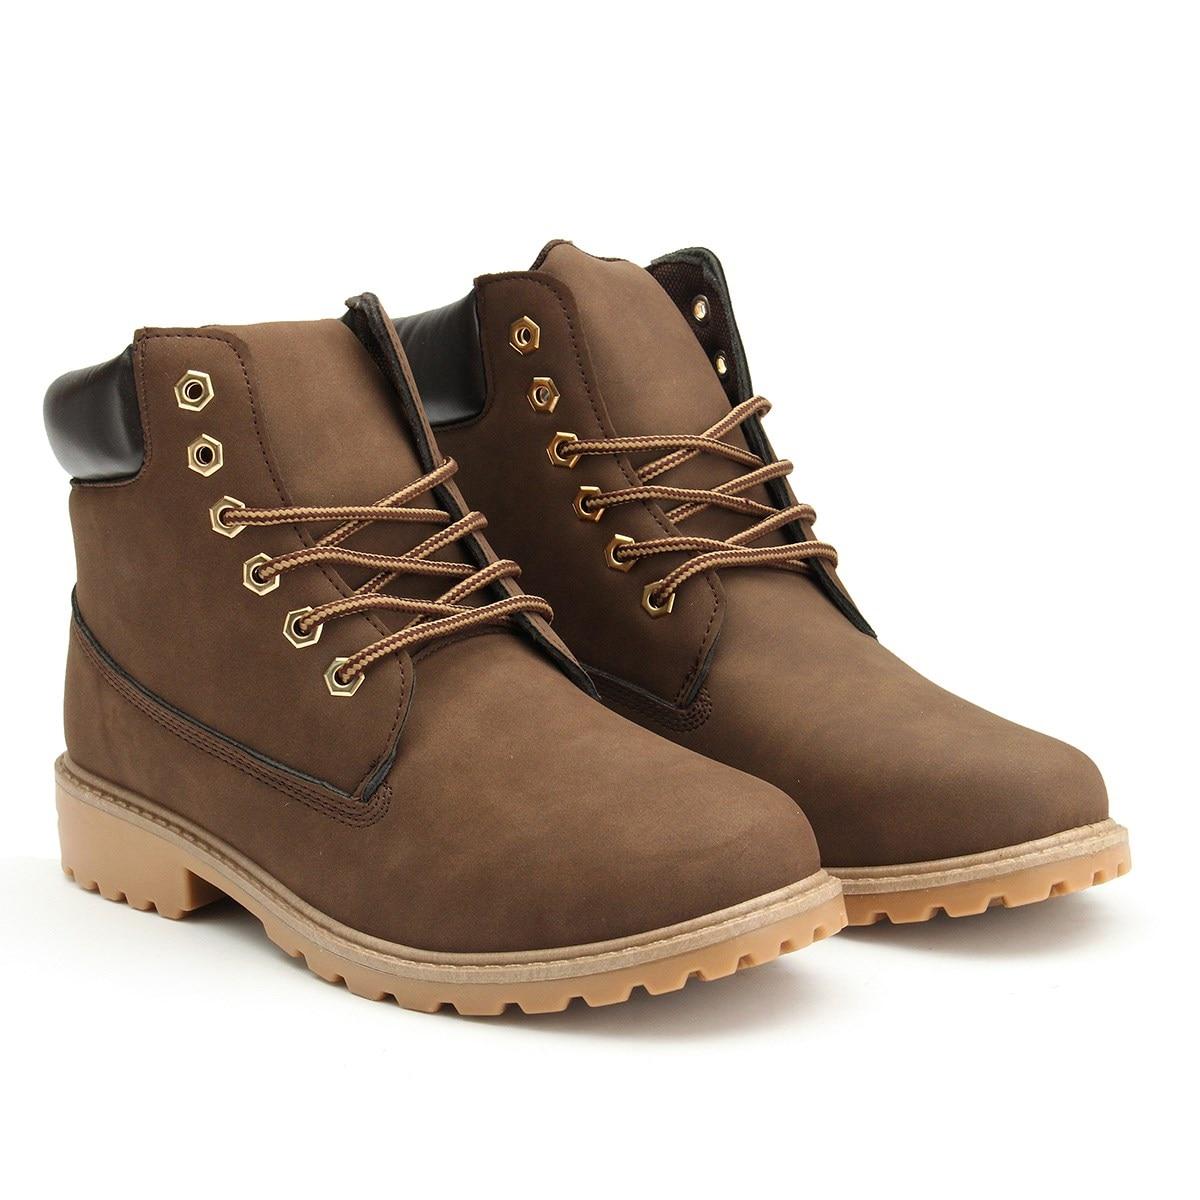 short combat boots for girls | Gommap Blog